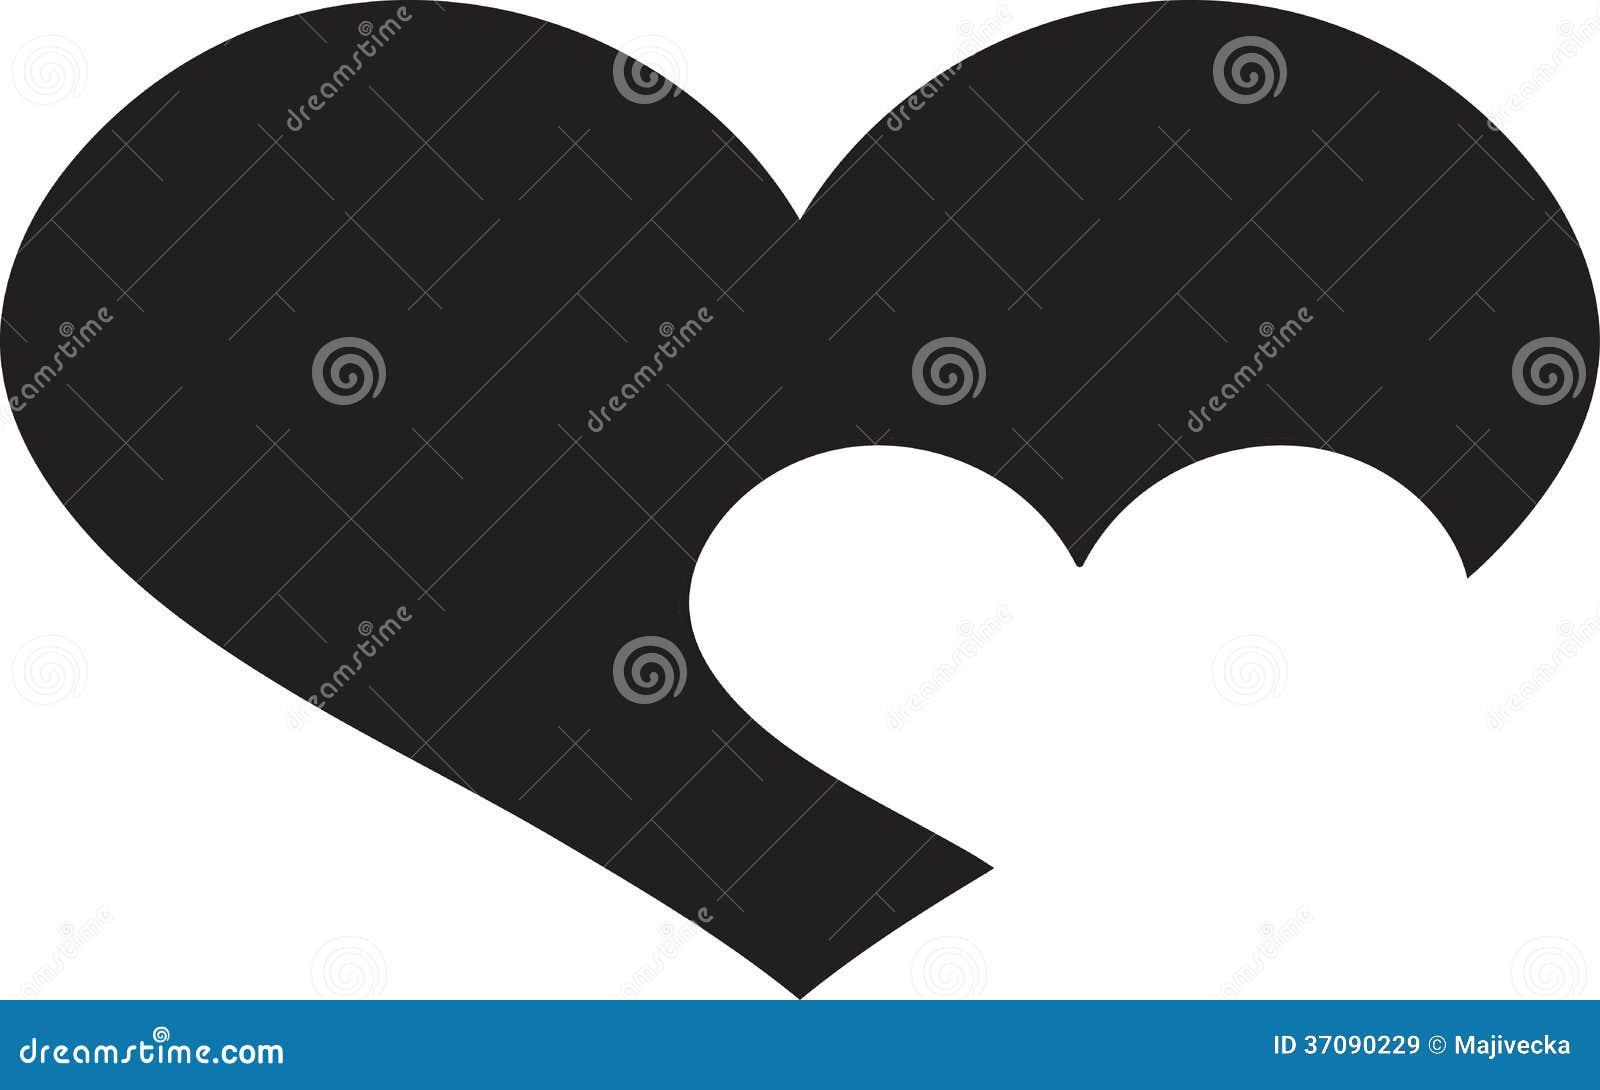 Download Wektorowa Sylwetki Ilustracja Serce. Ilustracja Wektor - Ilustracja złożonej z szczęście, heart: 37090229